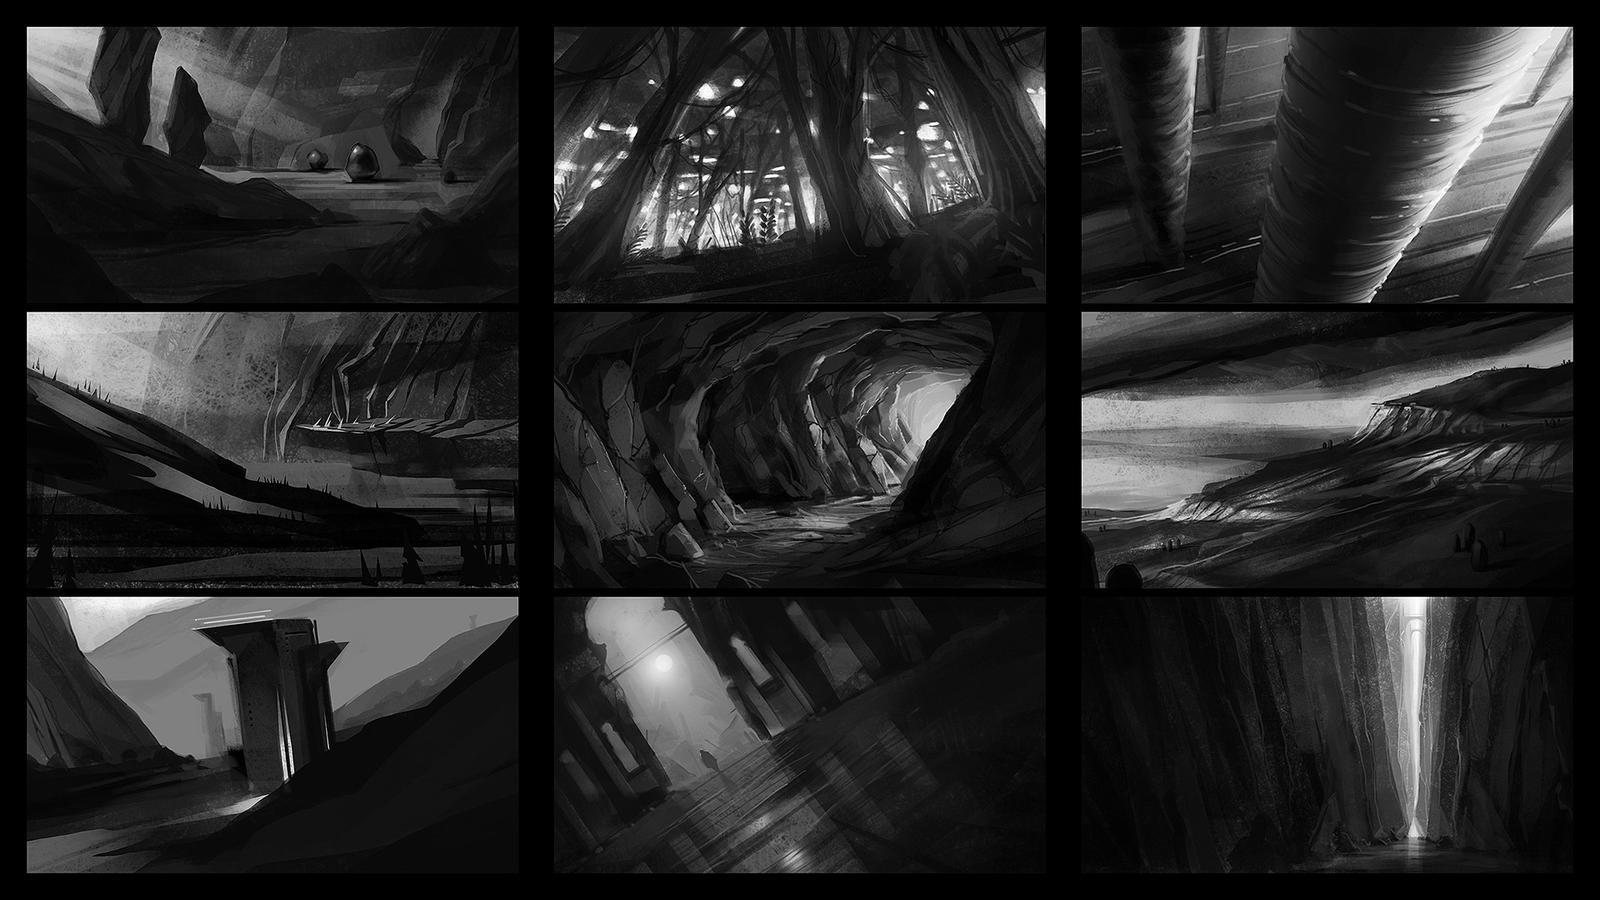 Thumbnail Study 1 by rammmon